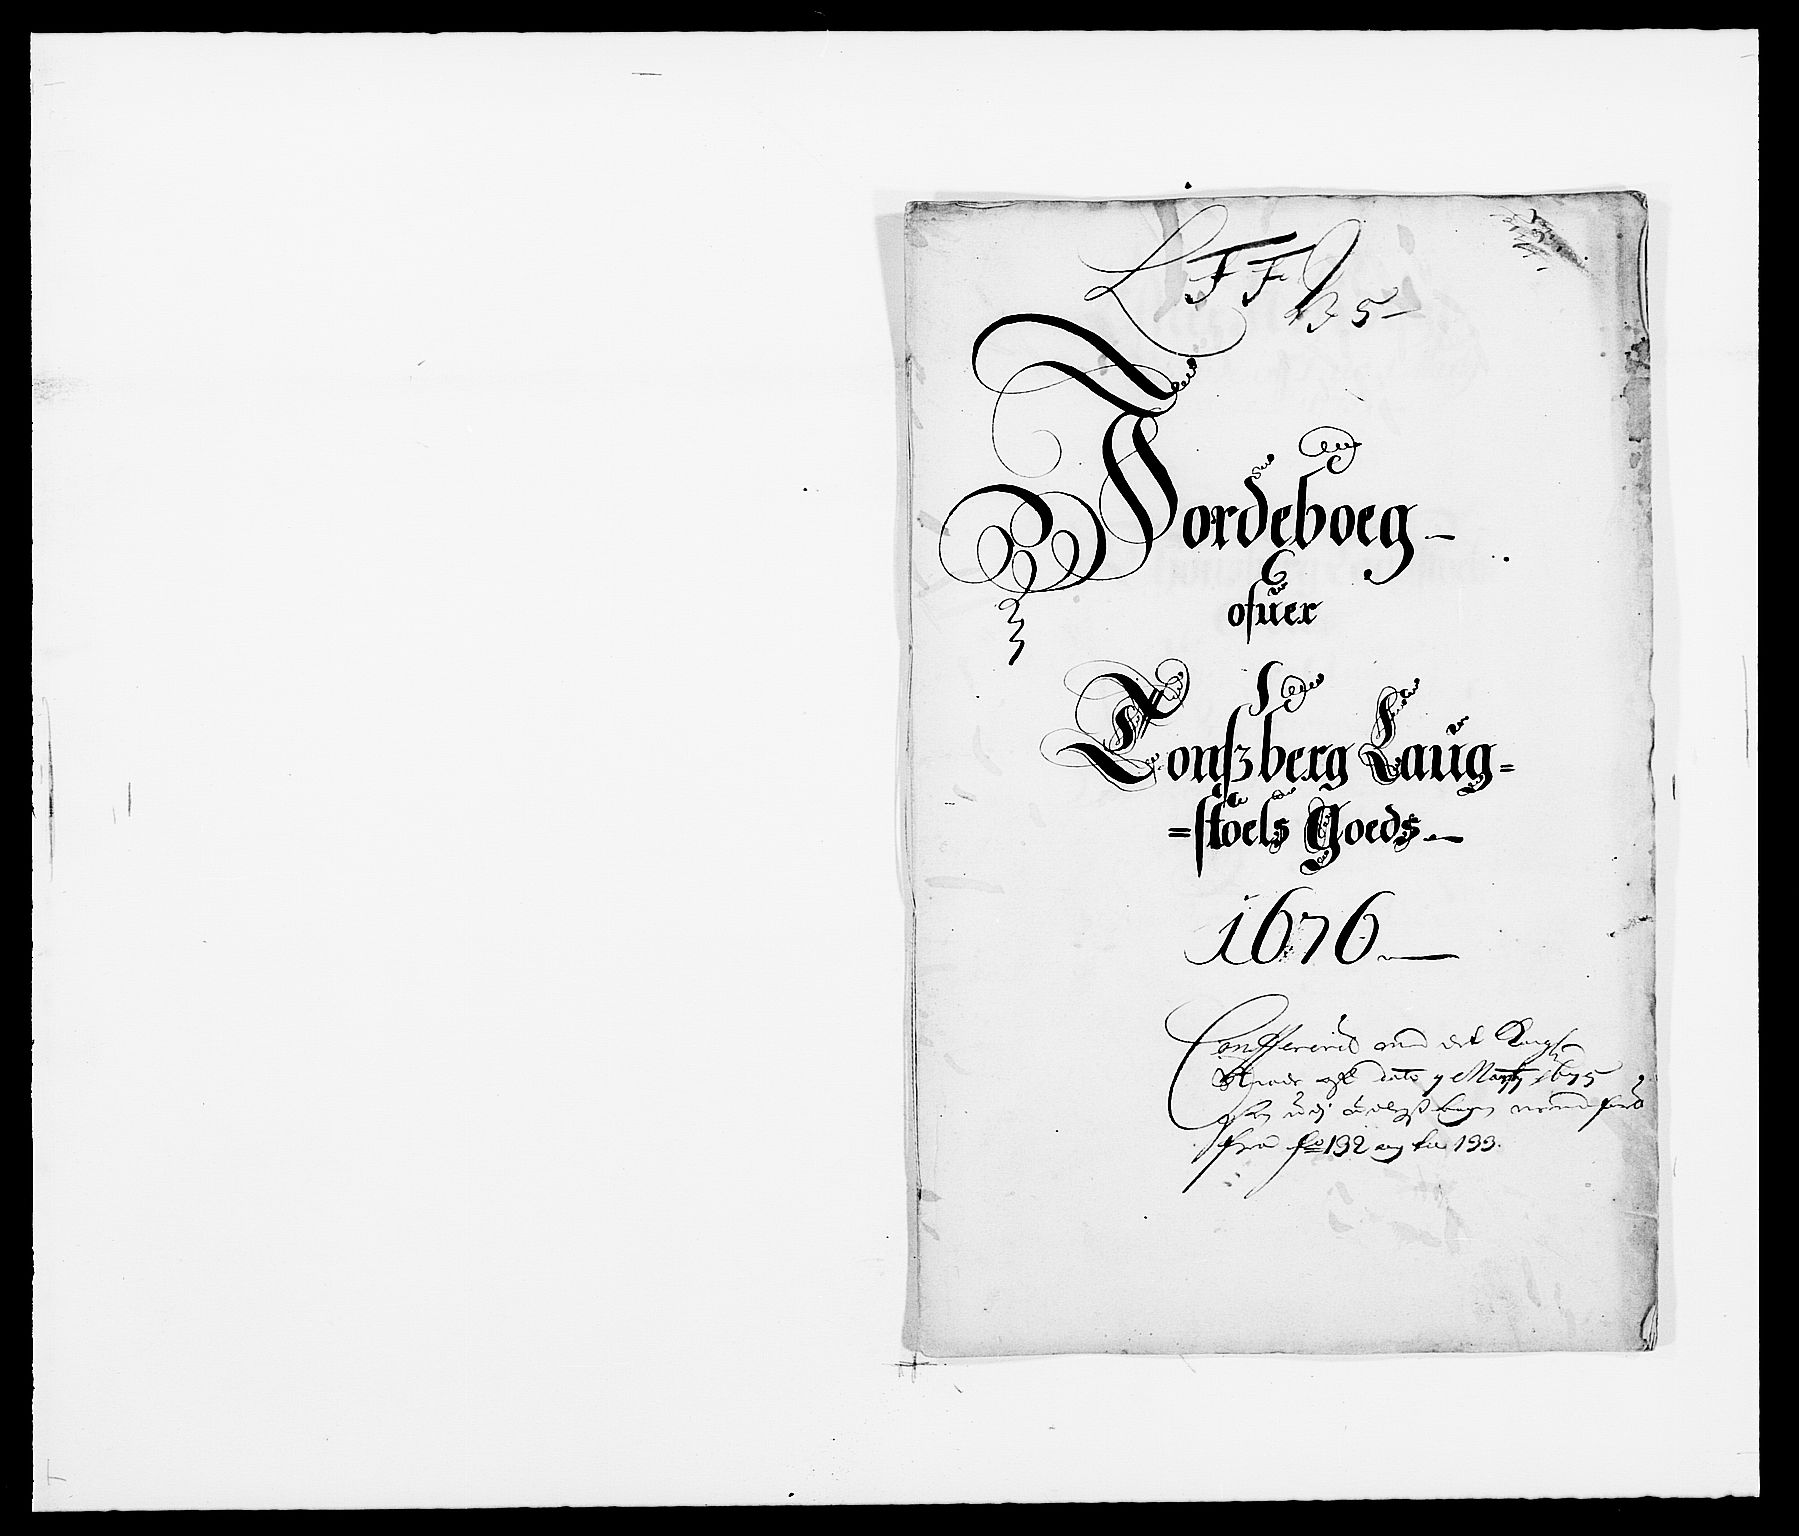 RA, Rentekammeret inntil 1814, Reviderte regnskaper, Fogderegnskap, R32/L1845: Fogderegnskap Jarlsberg grevskap, 1676-1678, s. 152